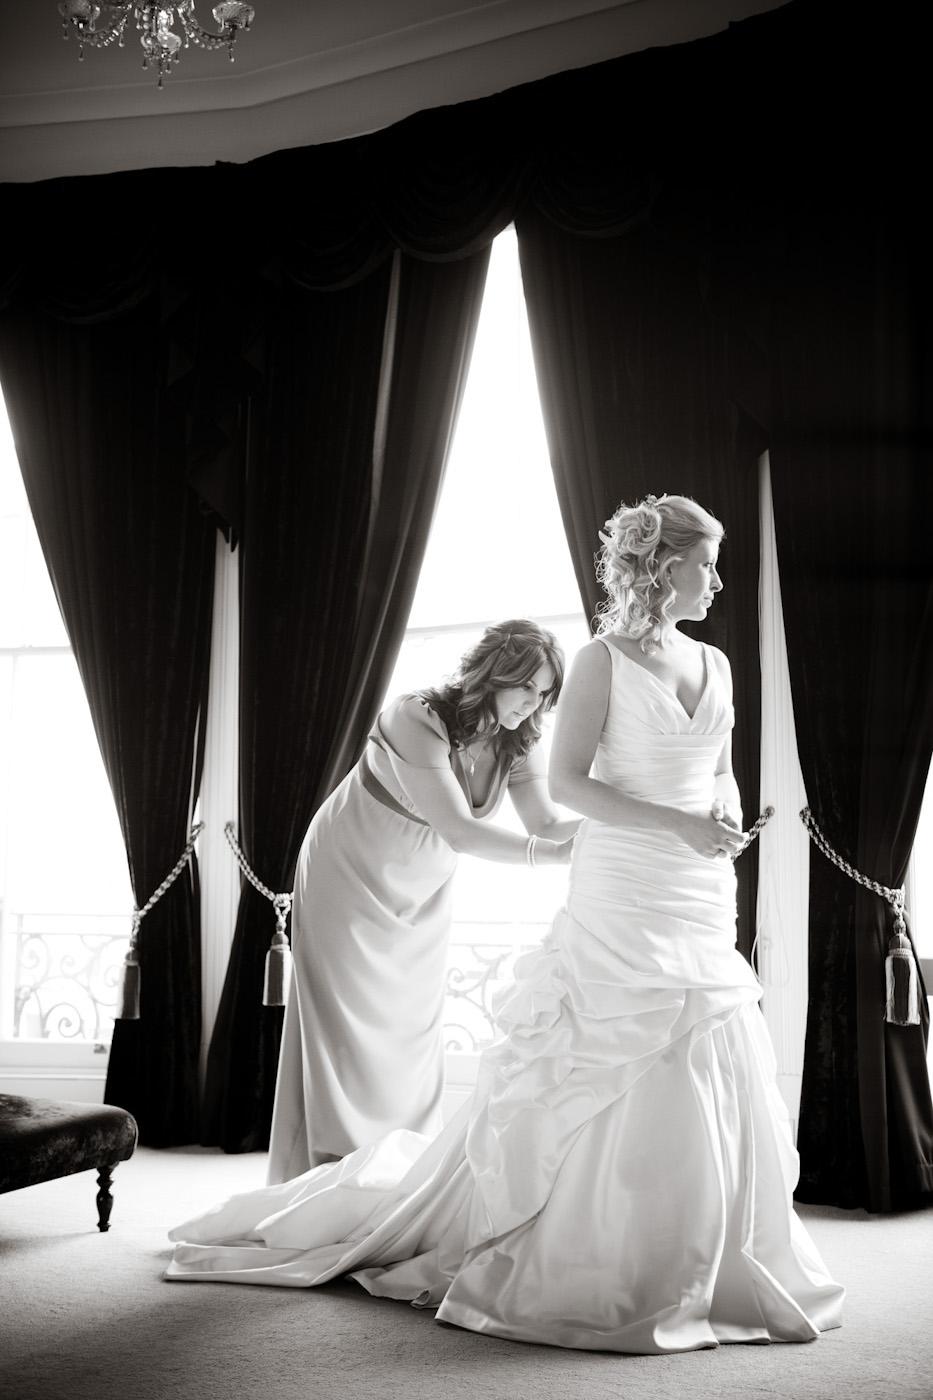 dan_burman_wedding_photography (8).jpg